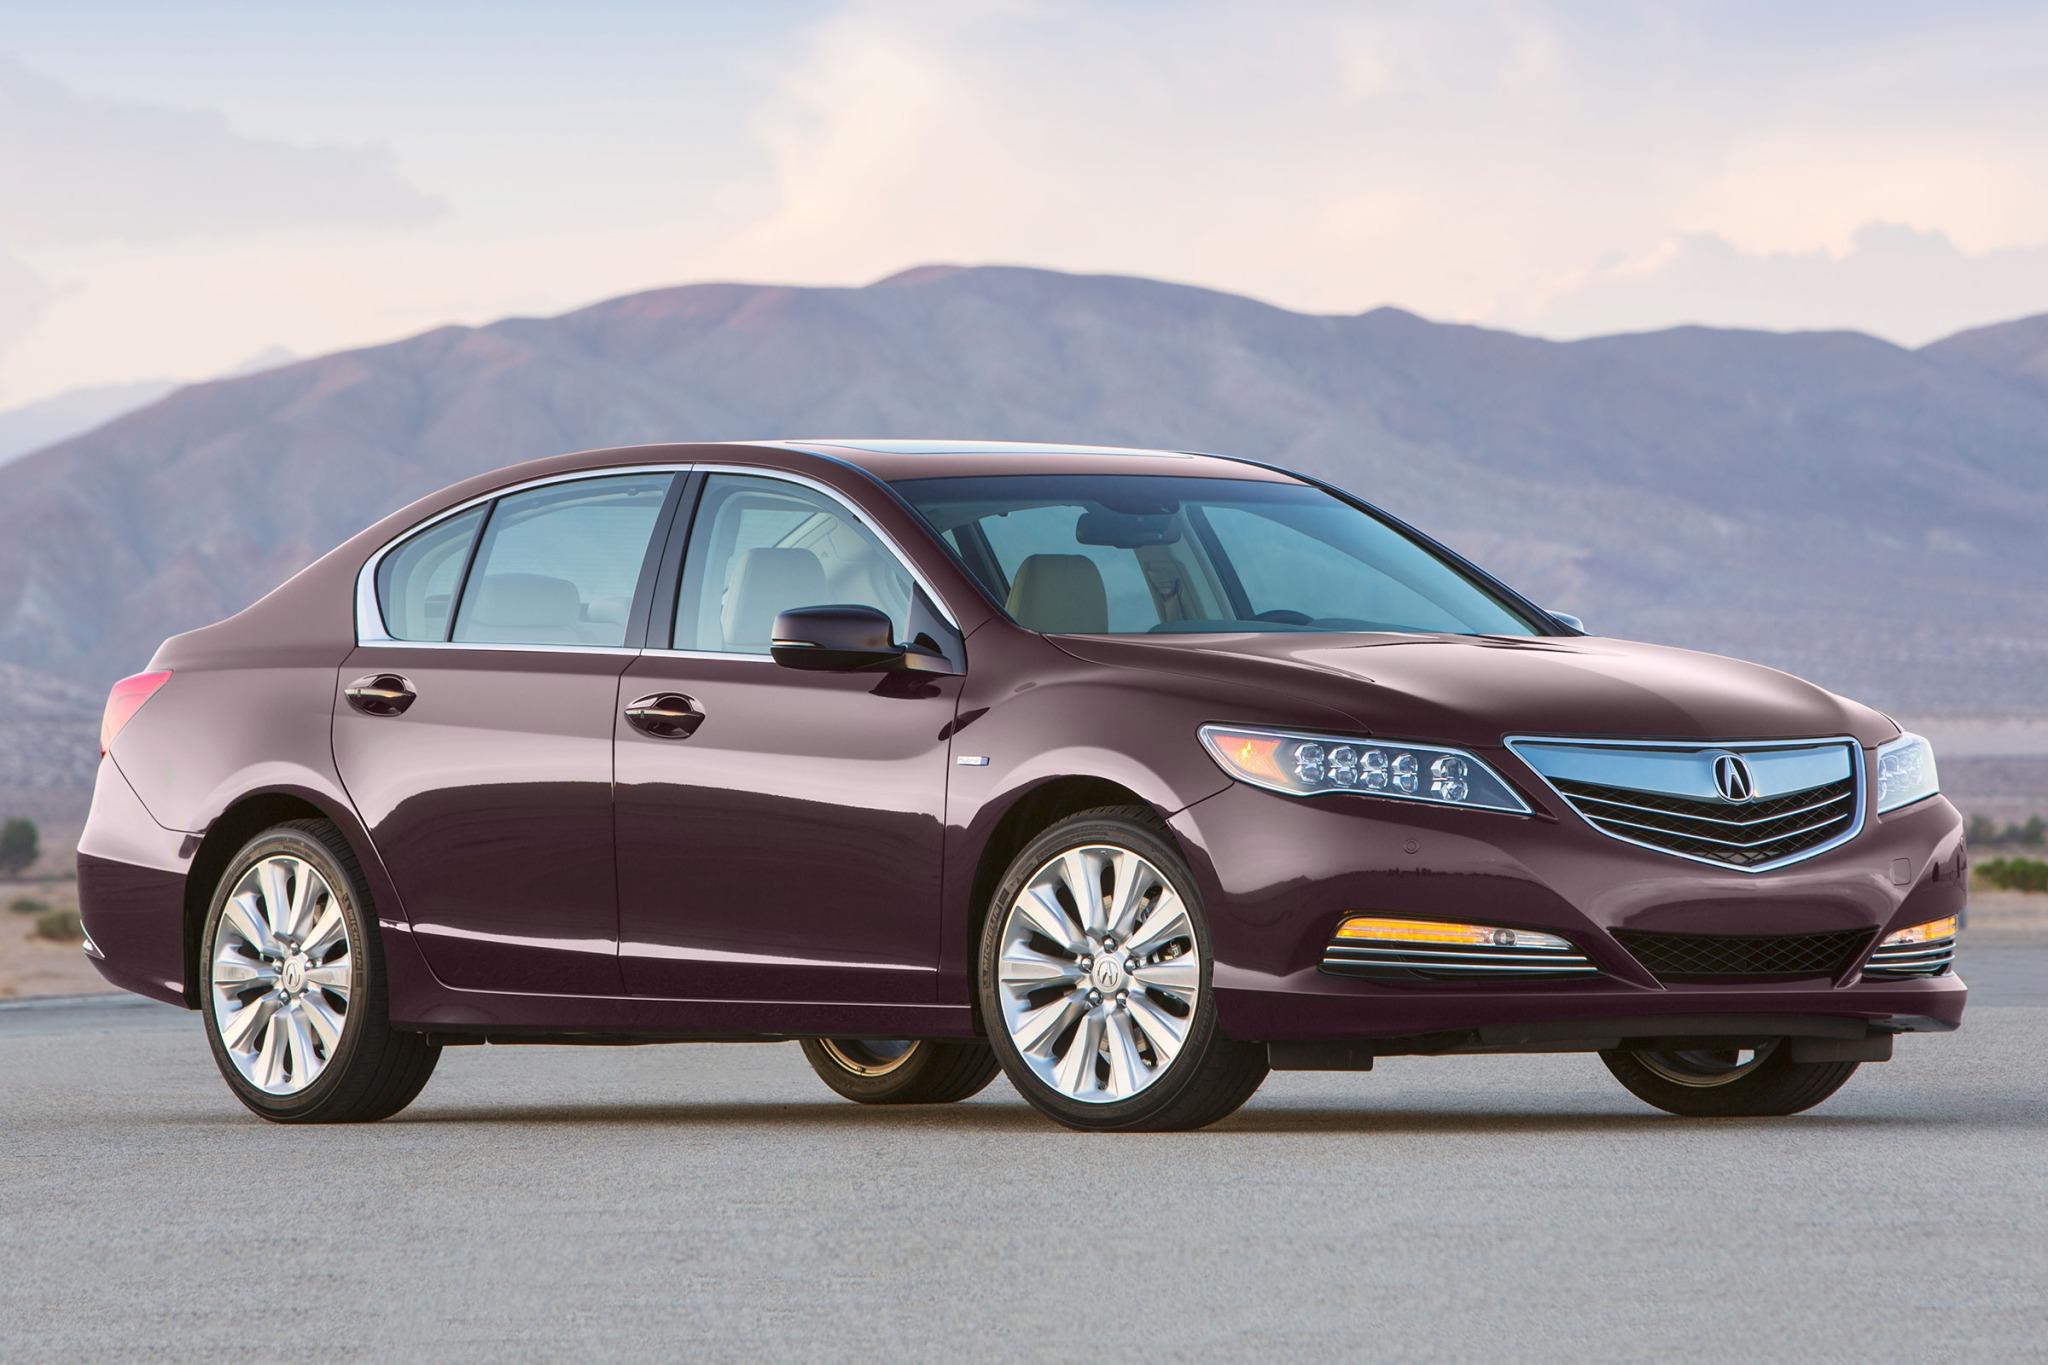 2016 acura rlx sedan sport hybrid sh awd wadvance package fq oem 1 2048